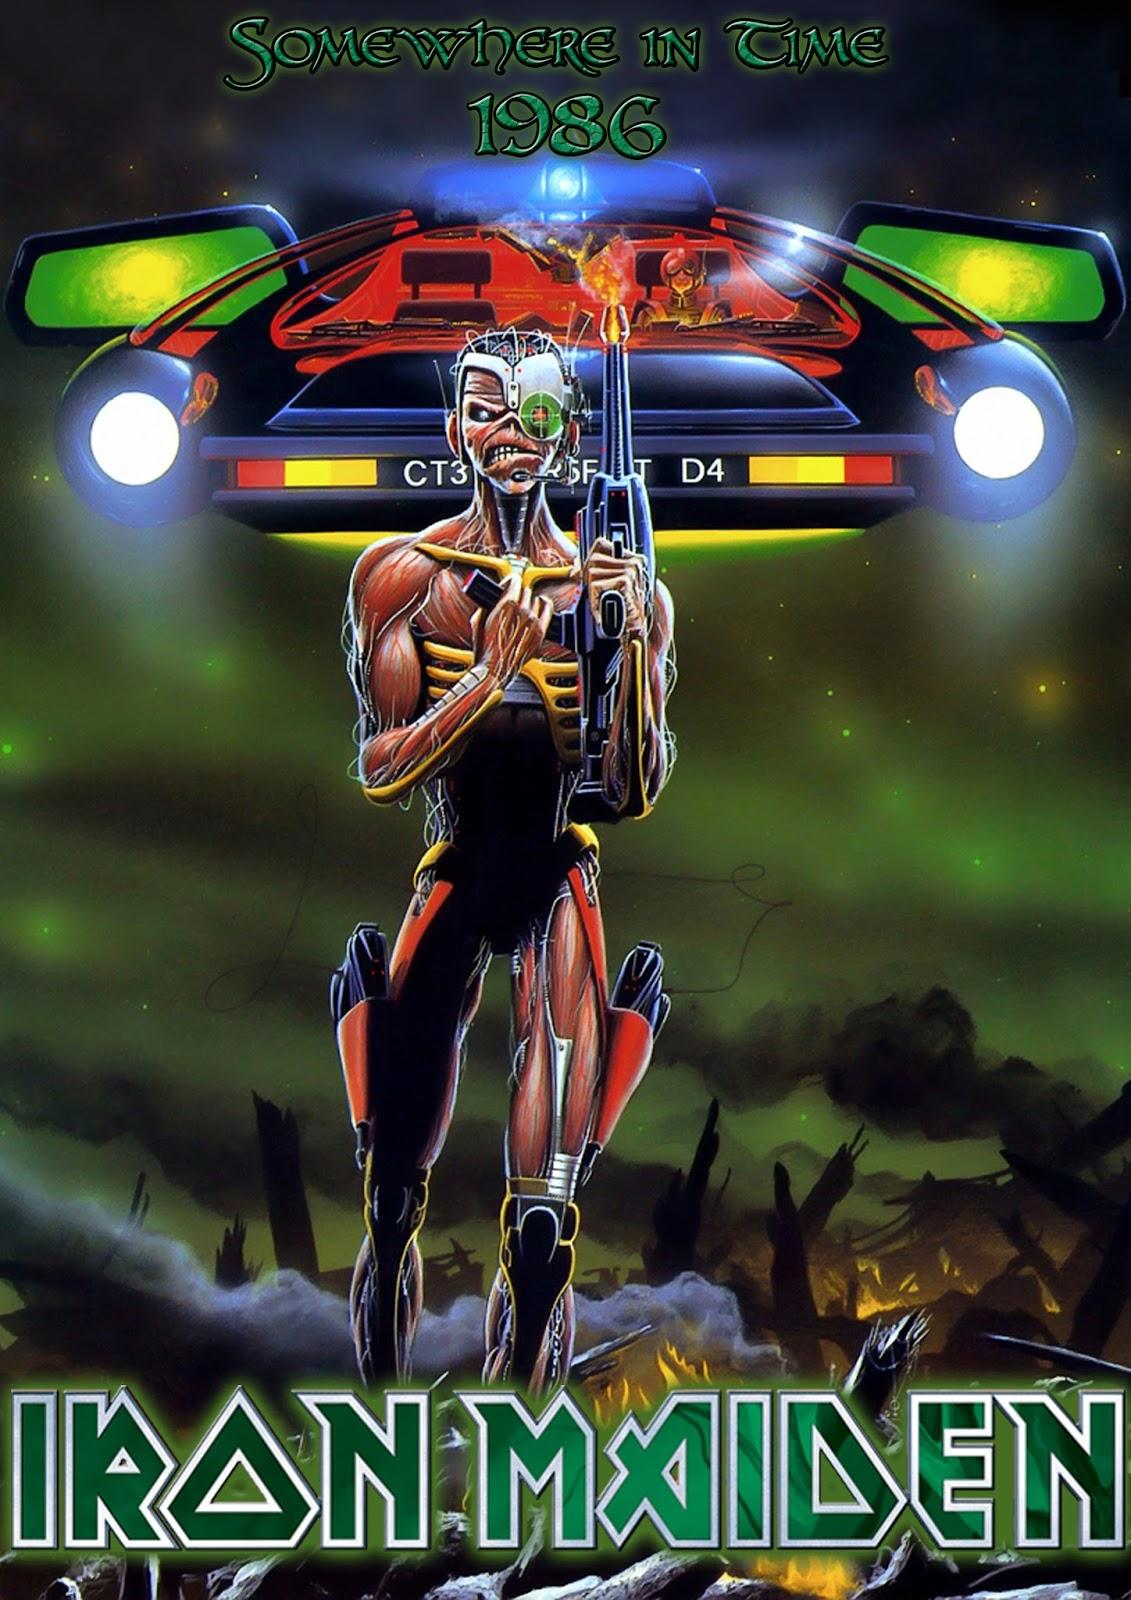 Metal Wallpaper Nash Iron Maiden Somewhere In Time